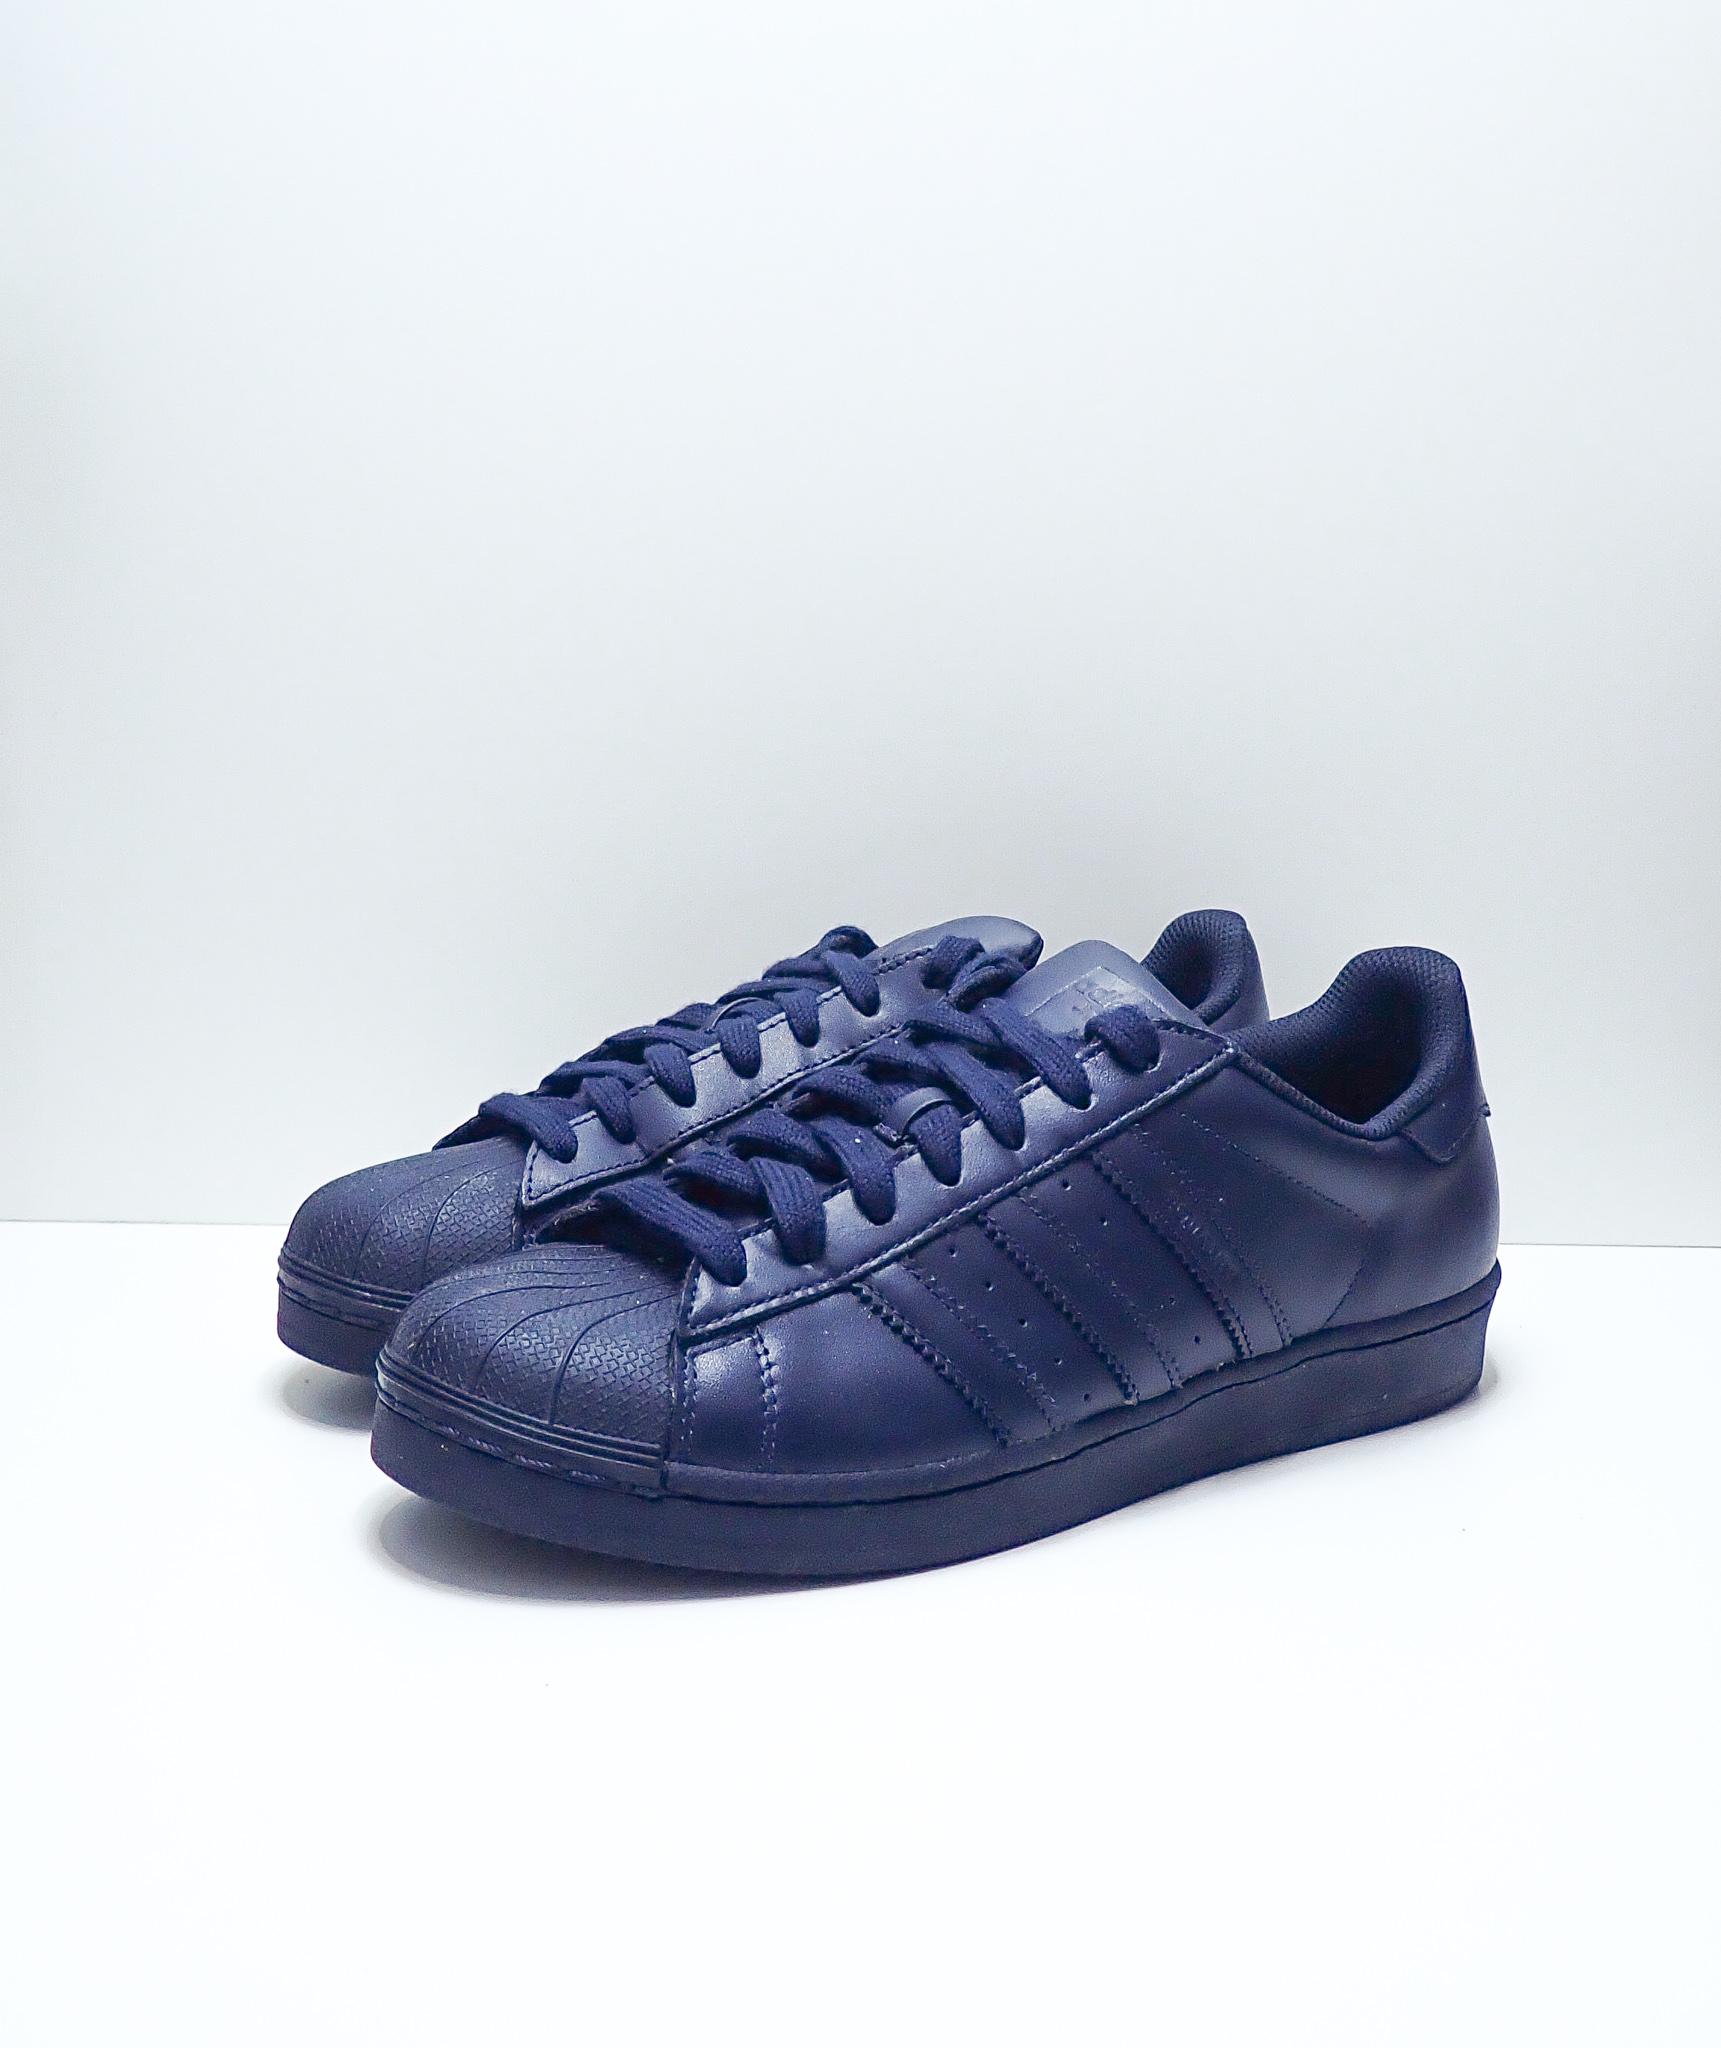 Adidas Superstar Supercolor Navy